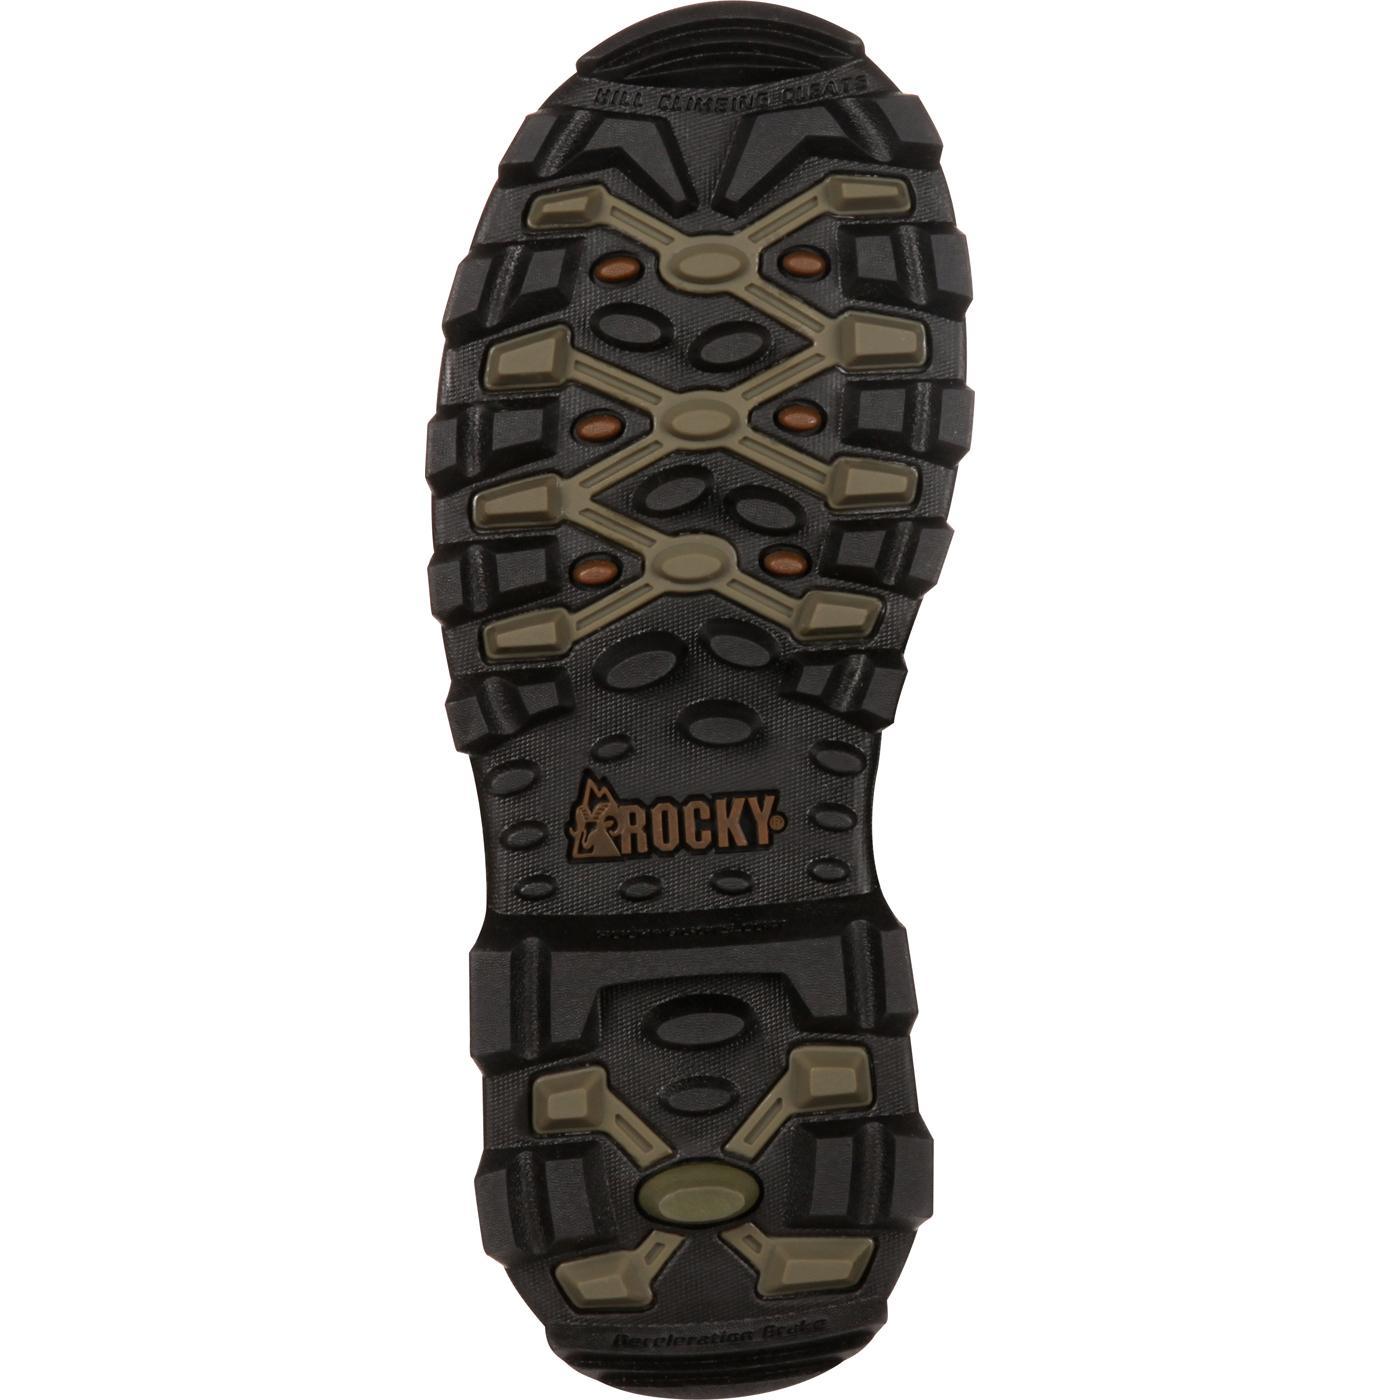 promo code 58d1b 24a45 Rocky Arktos Waterproof 400G Insulated Outdoor Boot